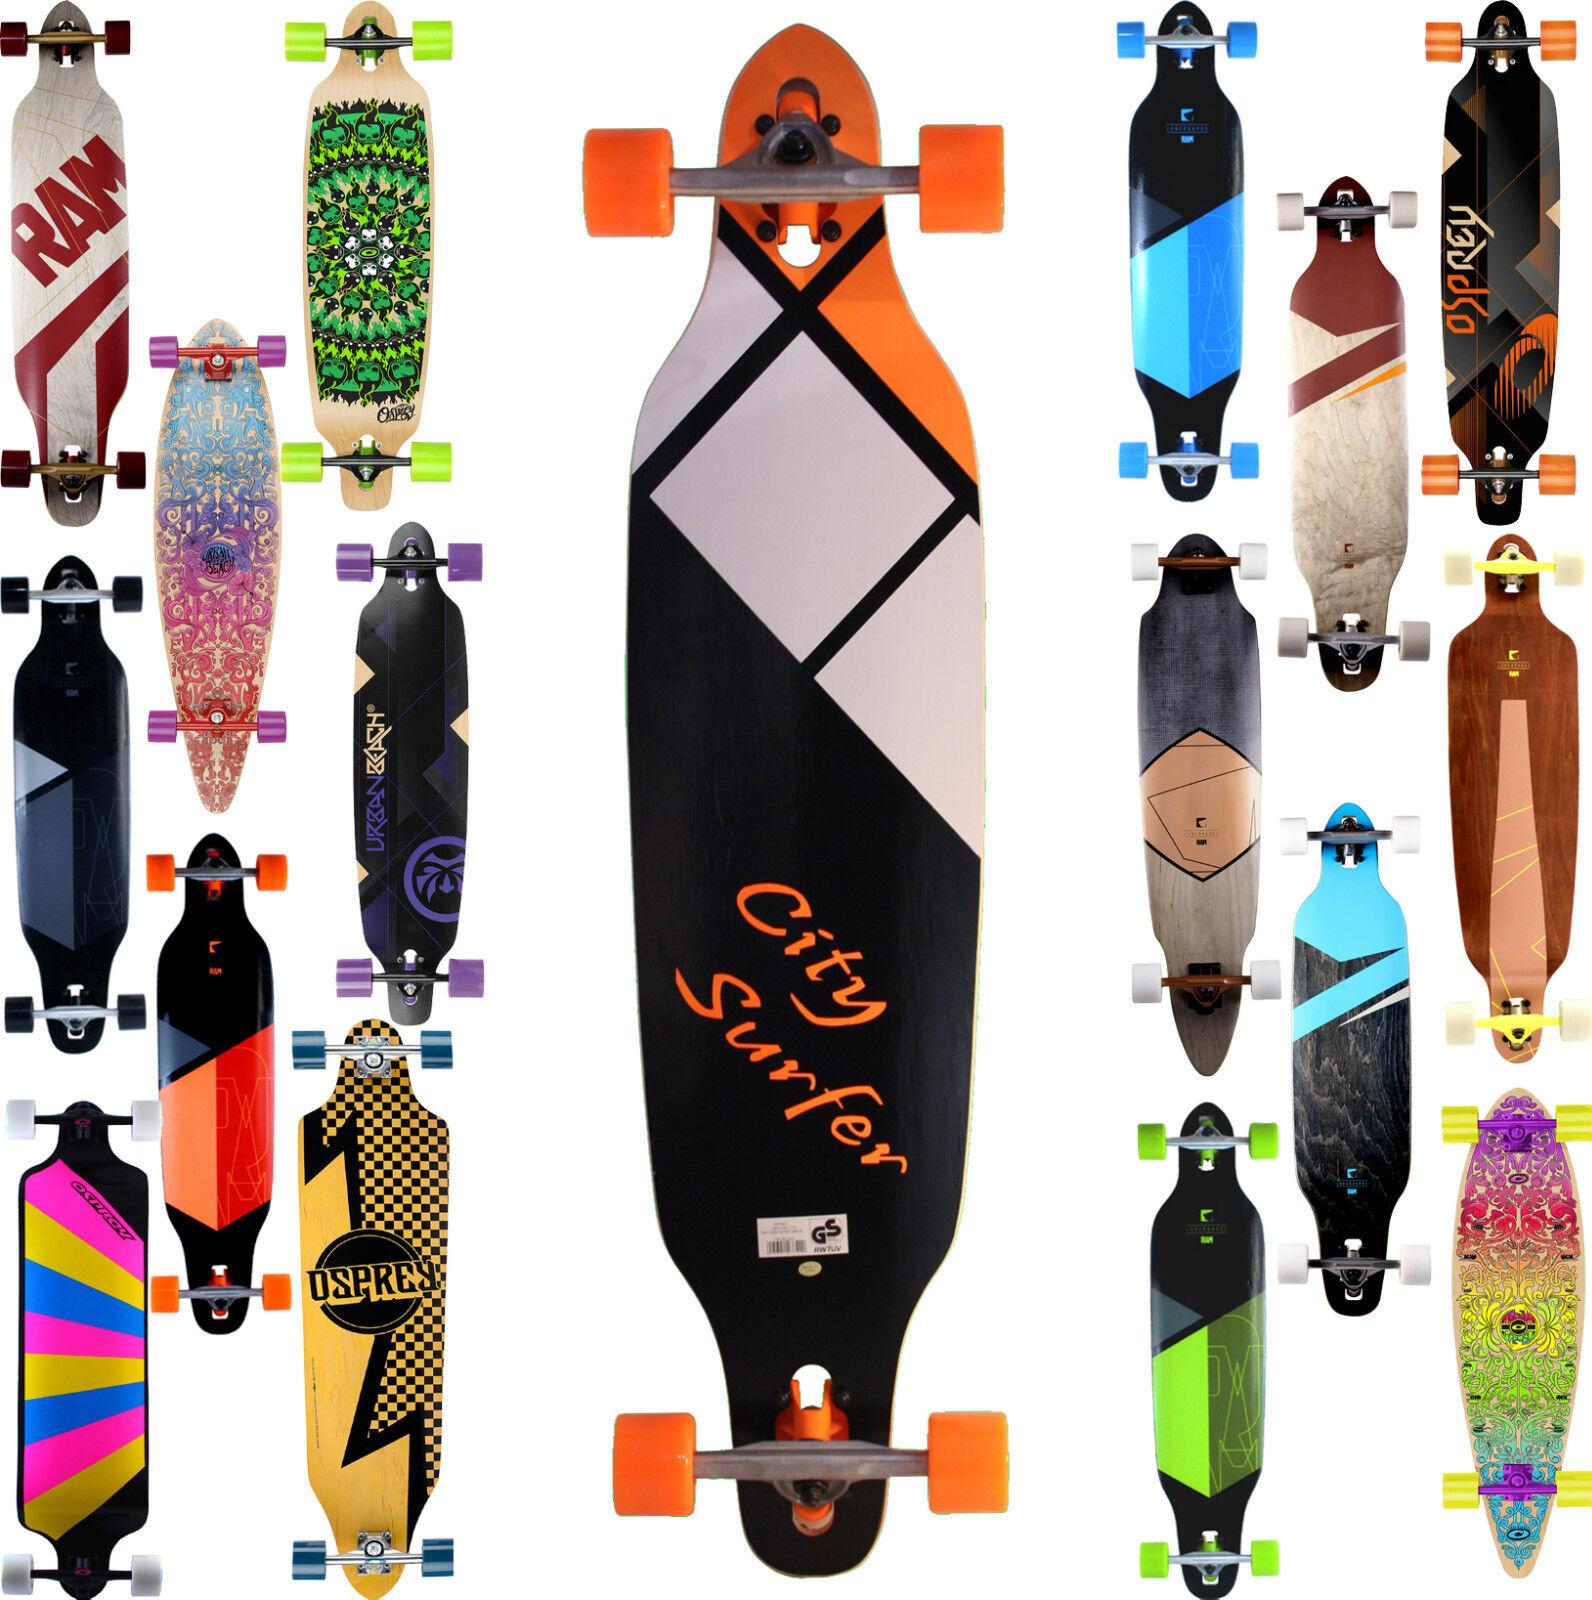 Komplett Longboard von SPARTAN  oder No No No Rules Skateboard - Modell 2017 Neu cc7721